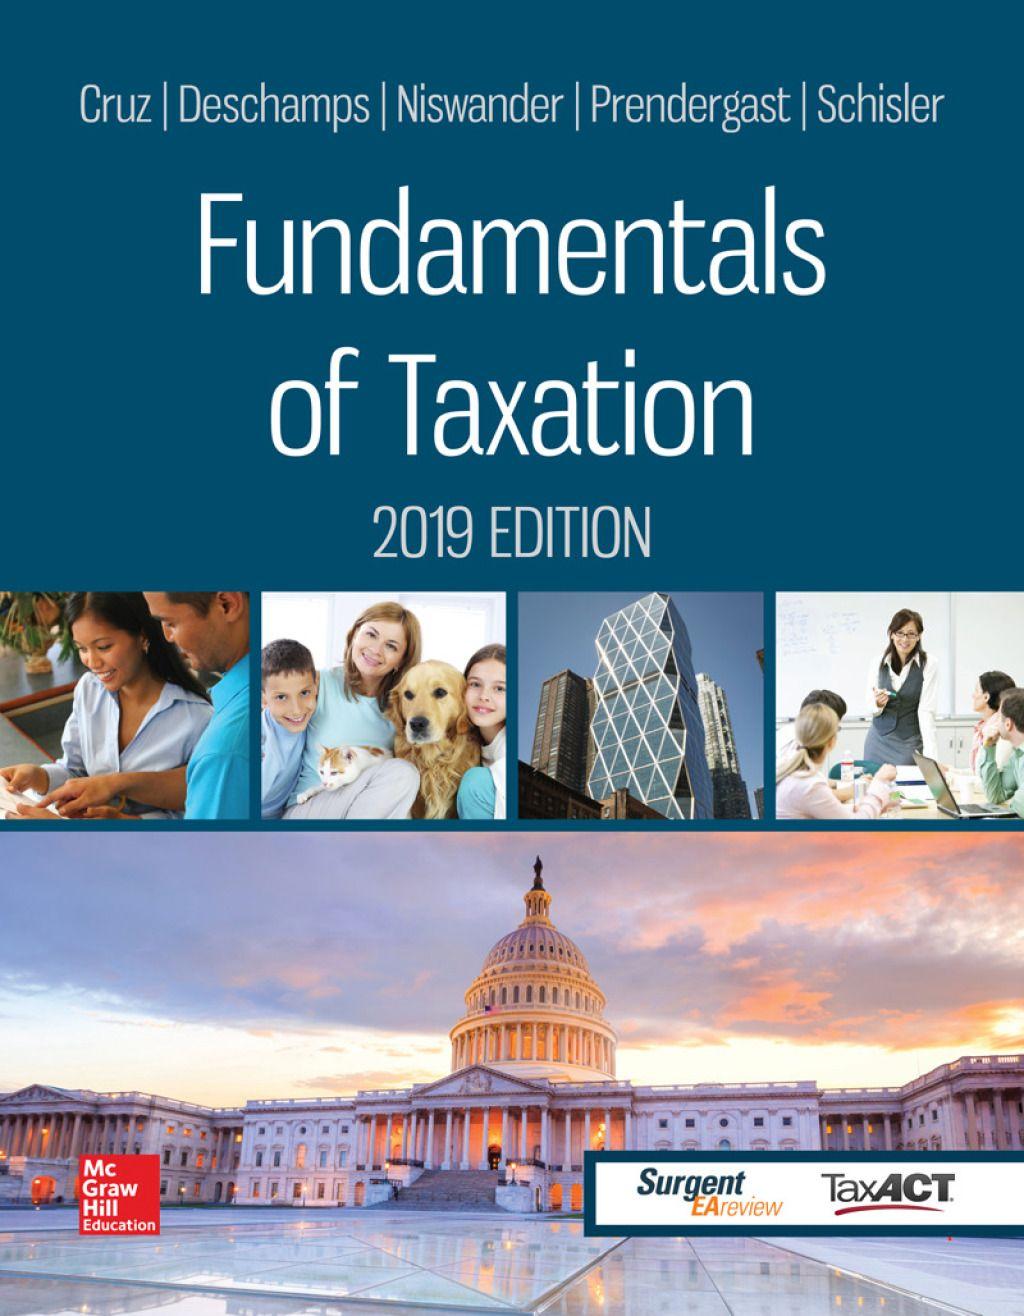 Fundamentals of taxation 2019 edition ebook rental in